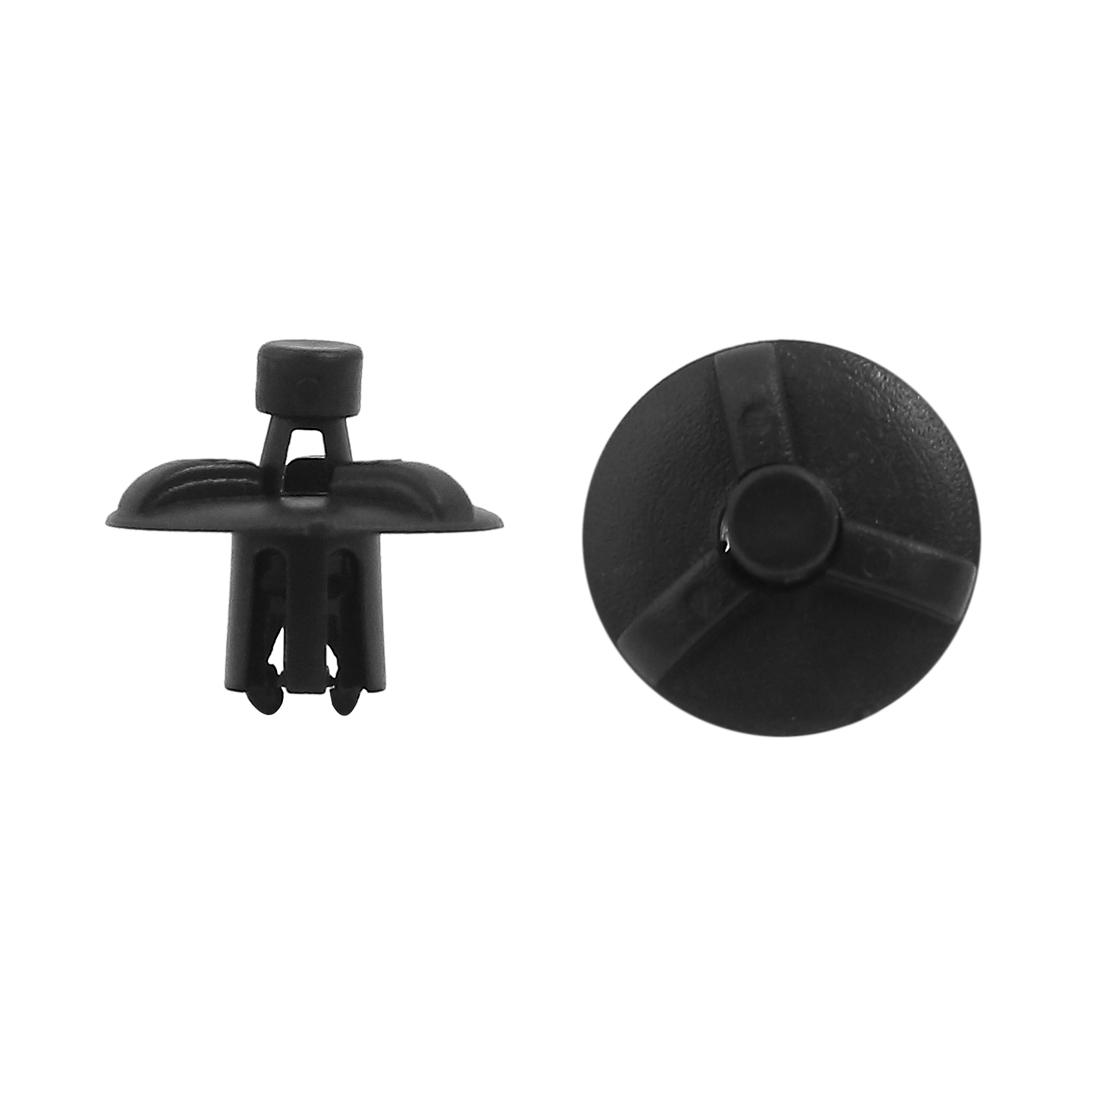 20 Pcs 7mm Hole Plastic Push Type Rivet Retainer Fastener Pin Clips for Automobile